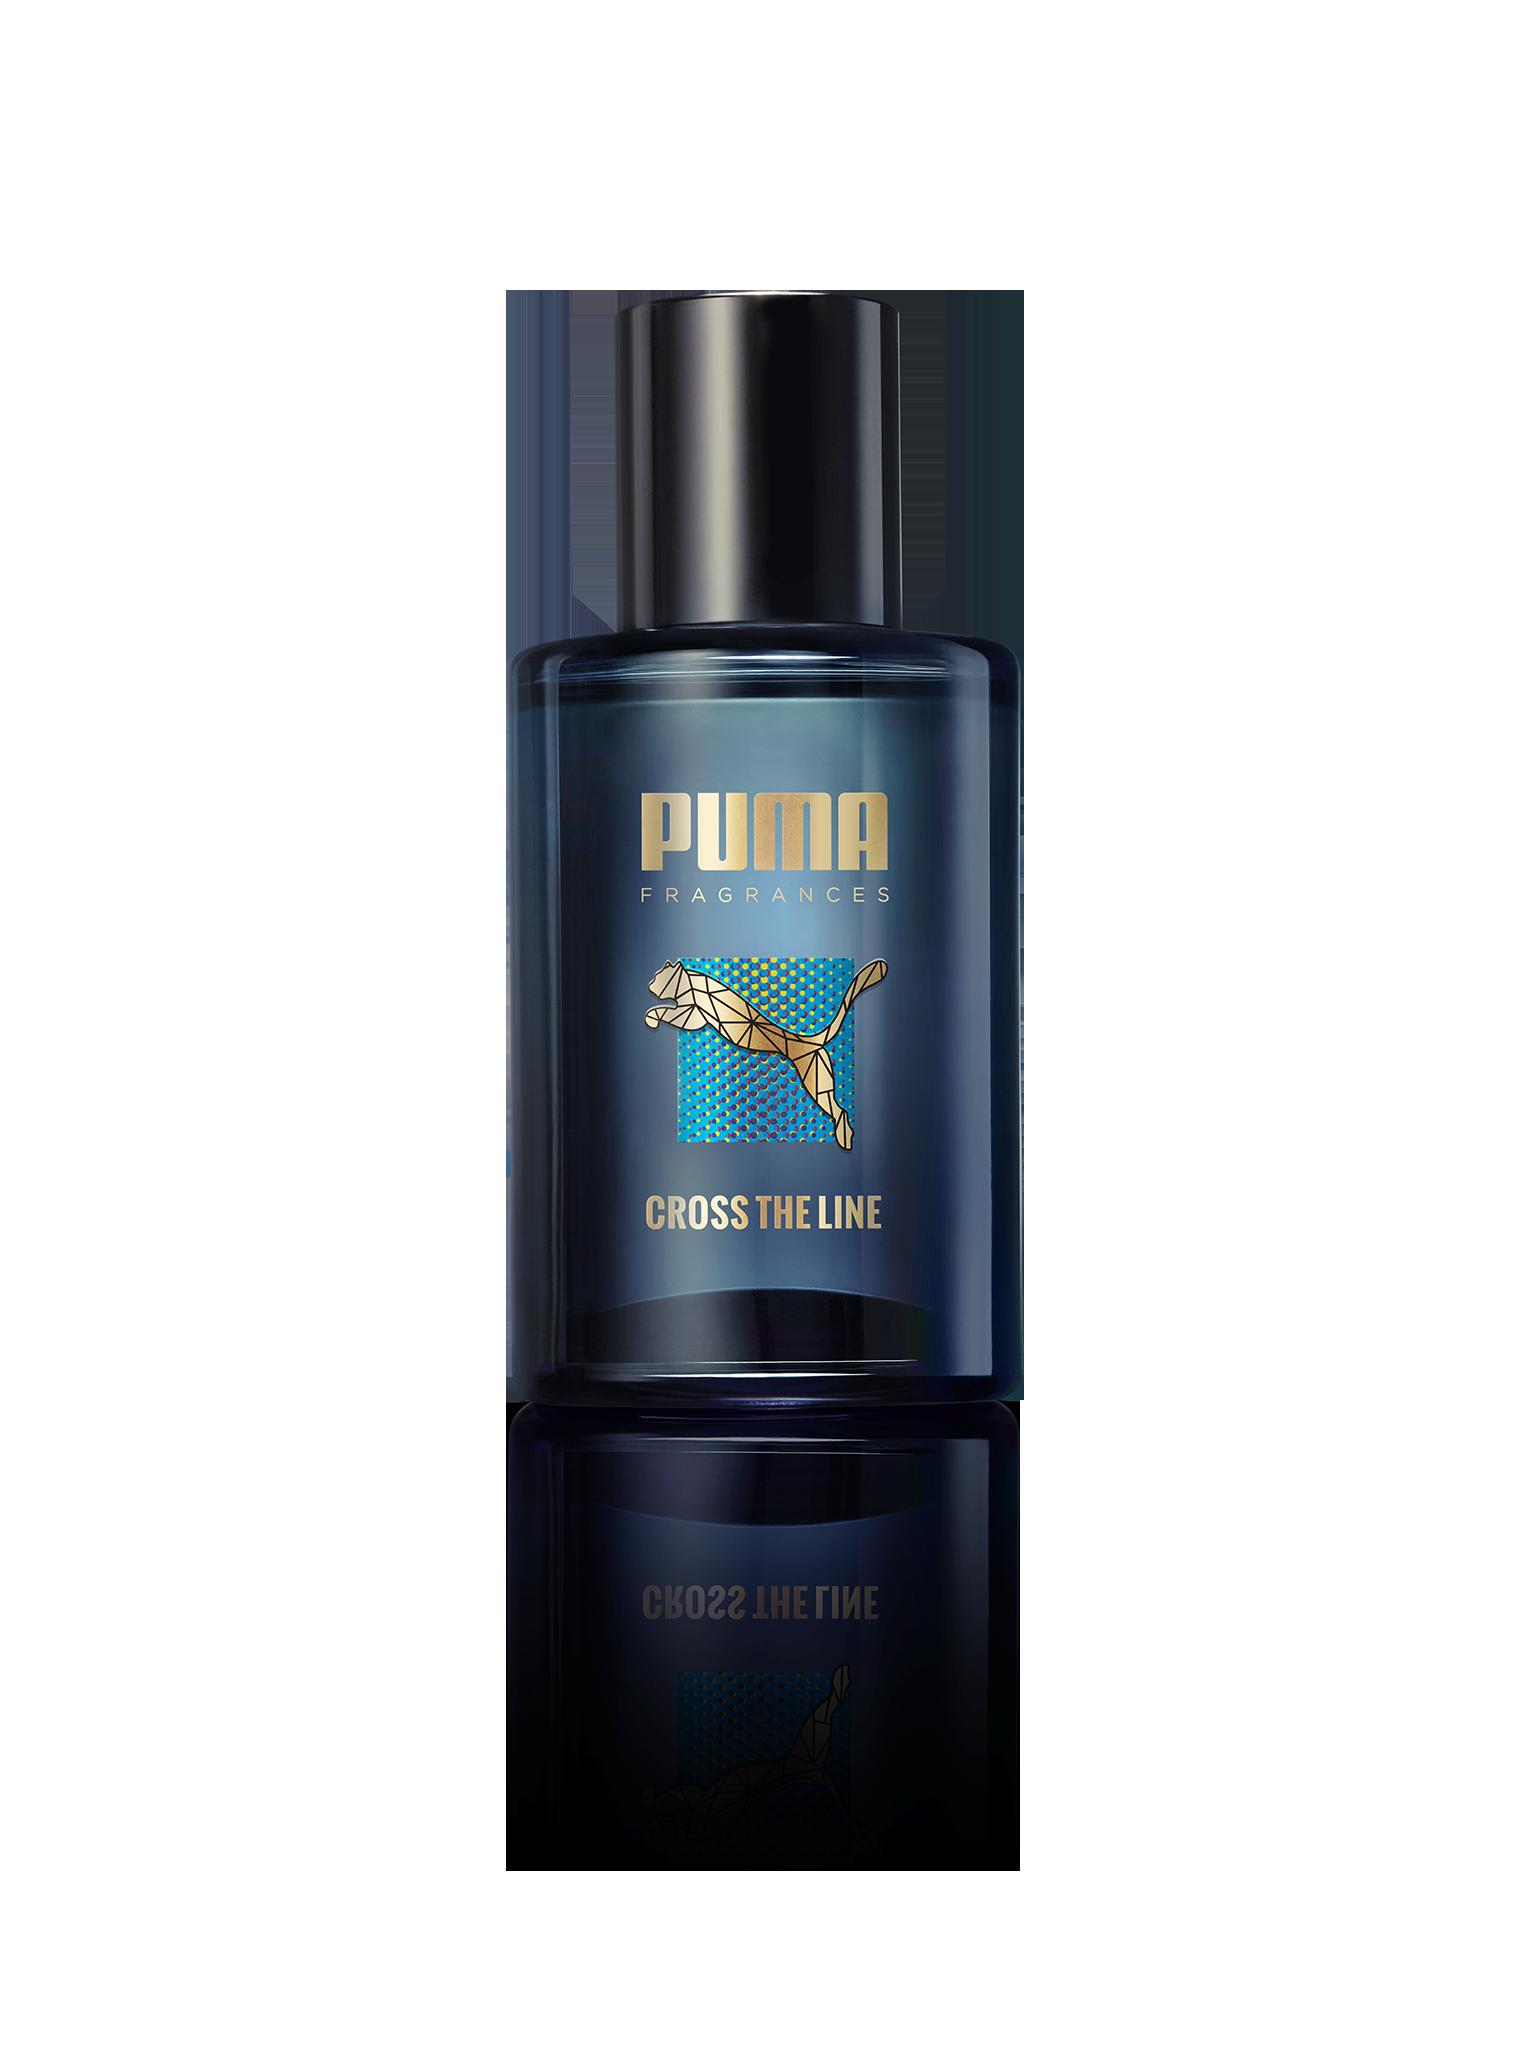 Fotografie Puma Cross the line toaletní voda 50 ml